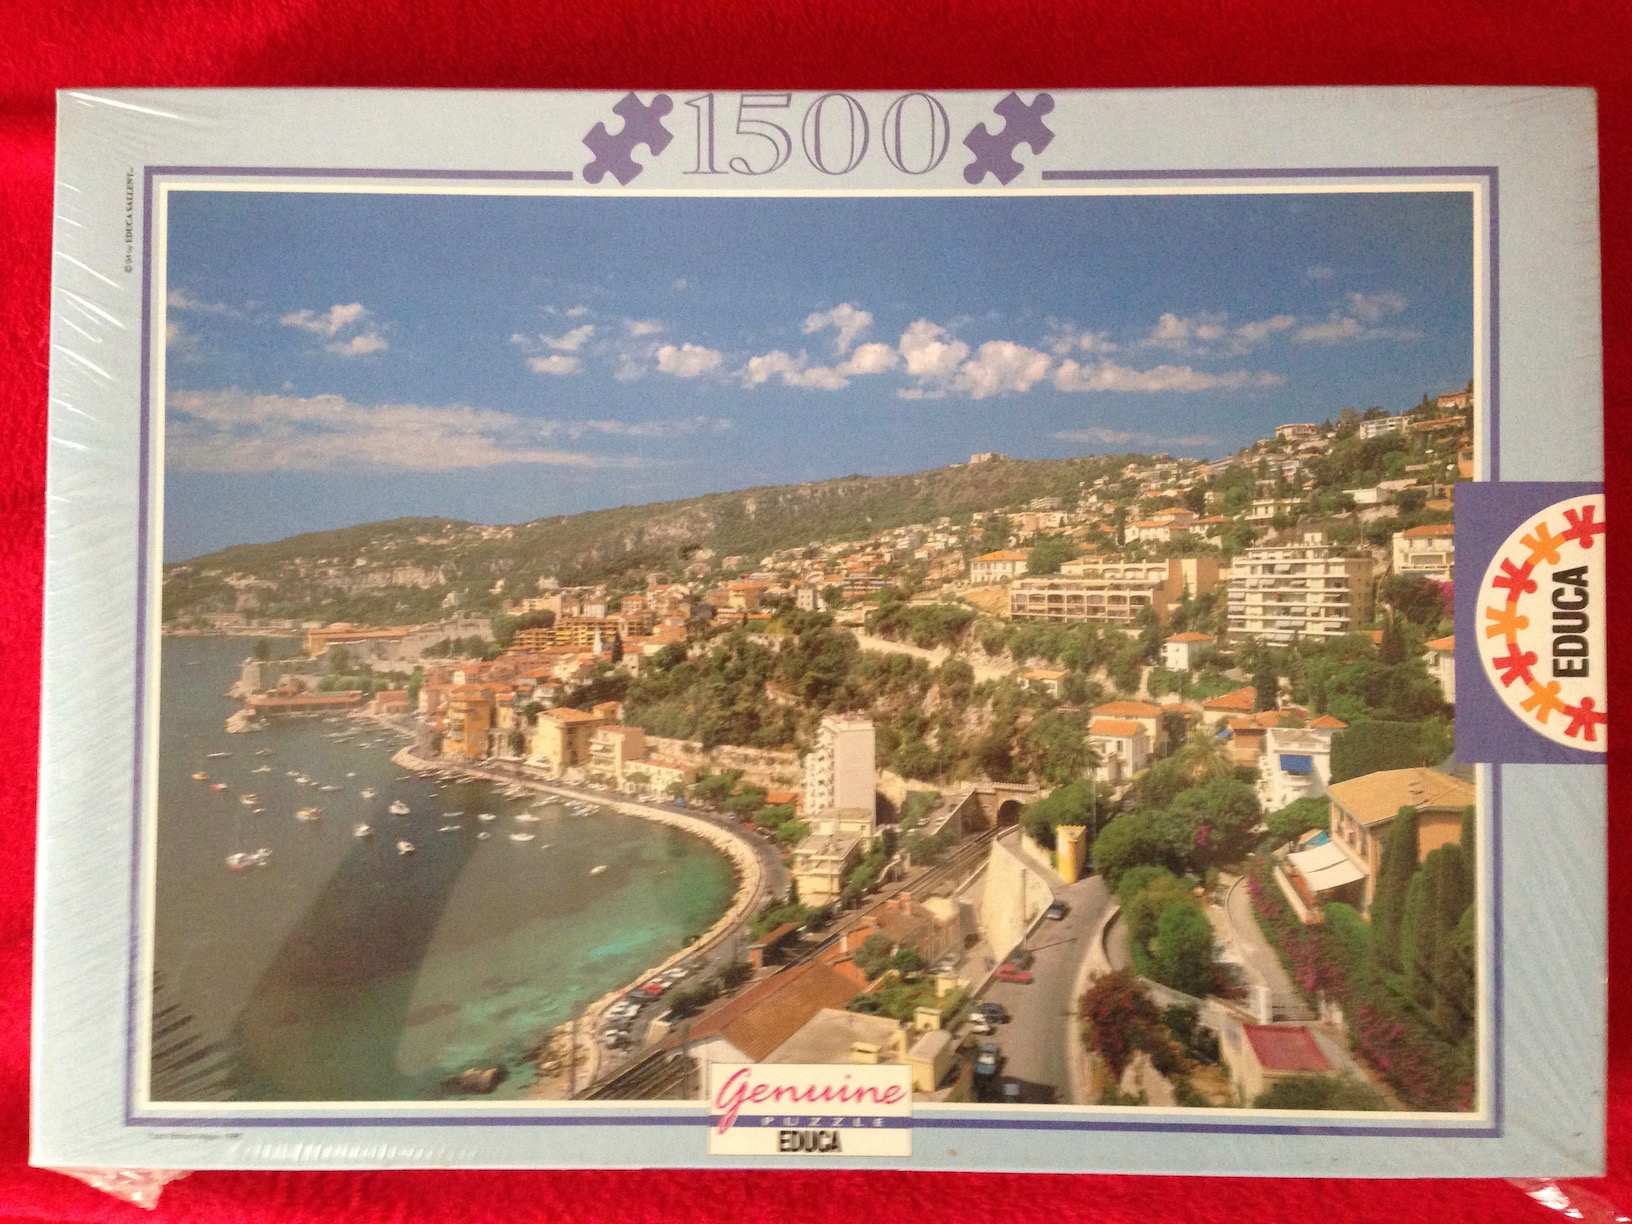 Image of the puzzle 1500, Educa, Villefranche-sur-Mer, France